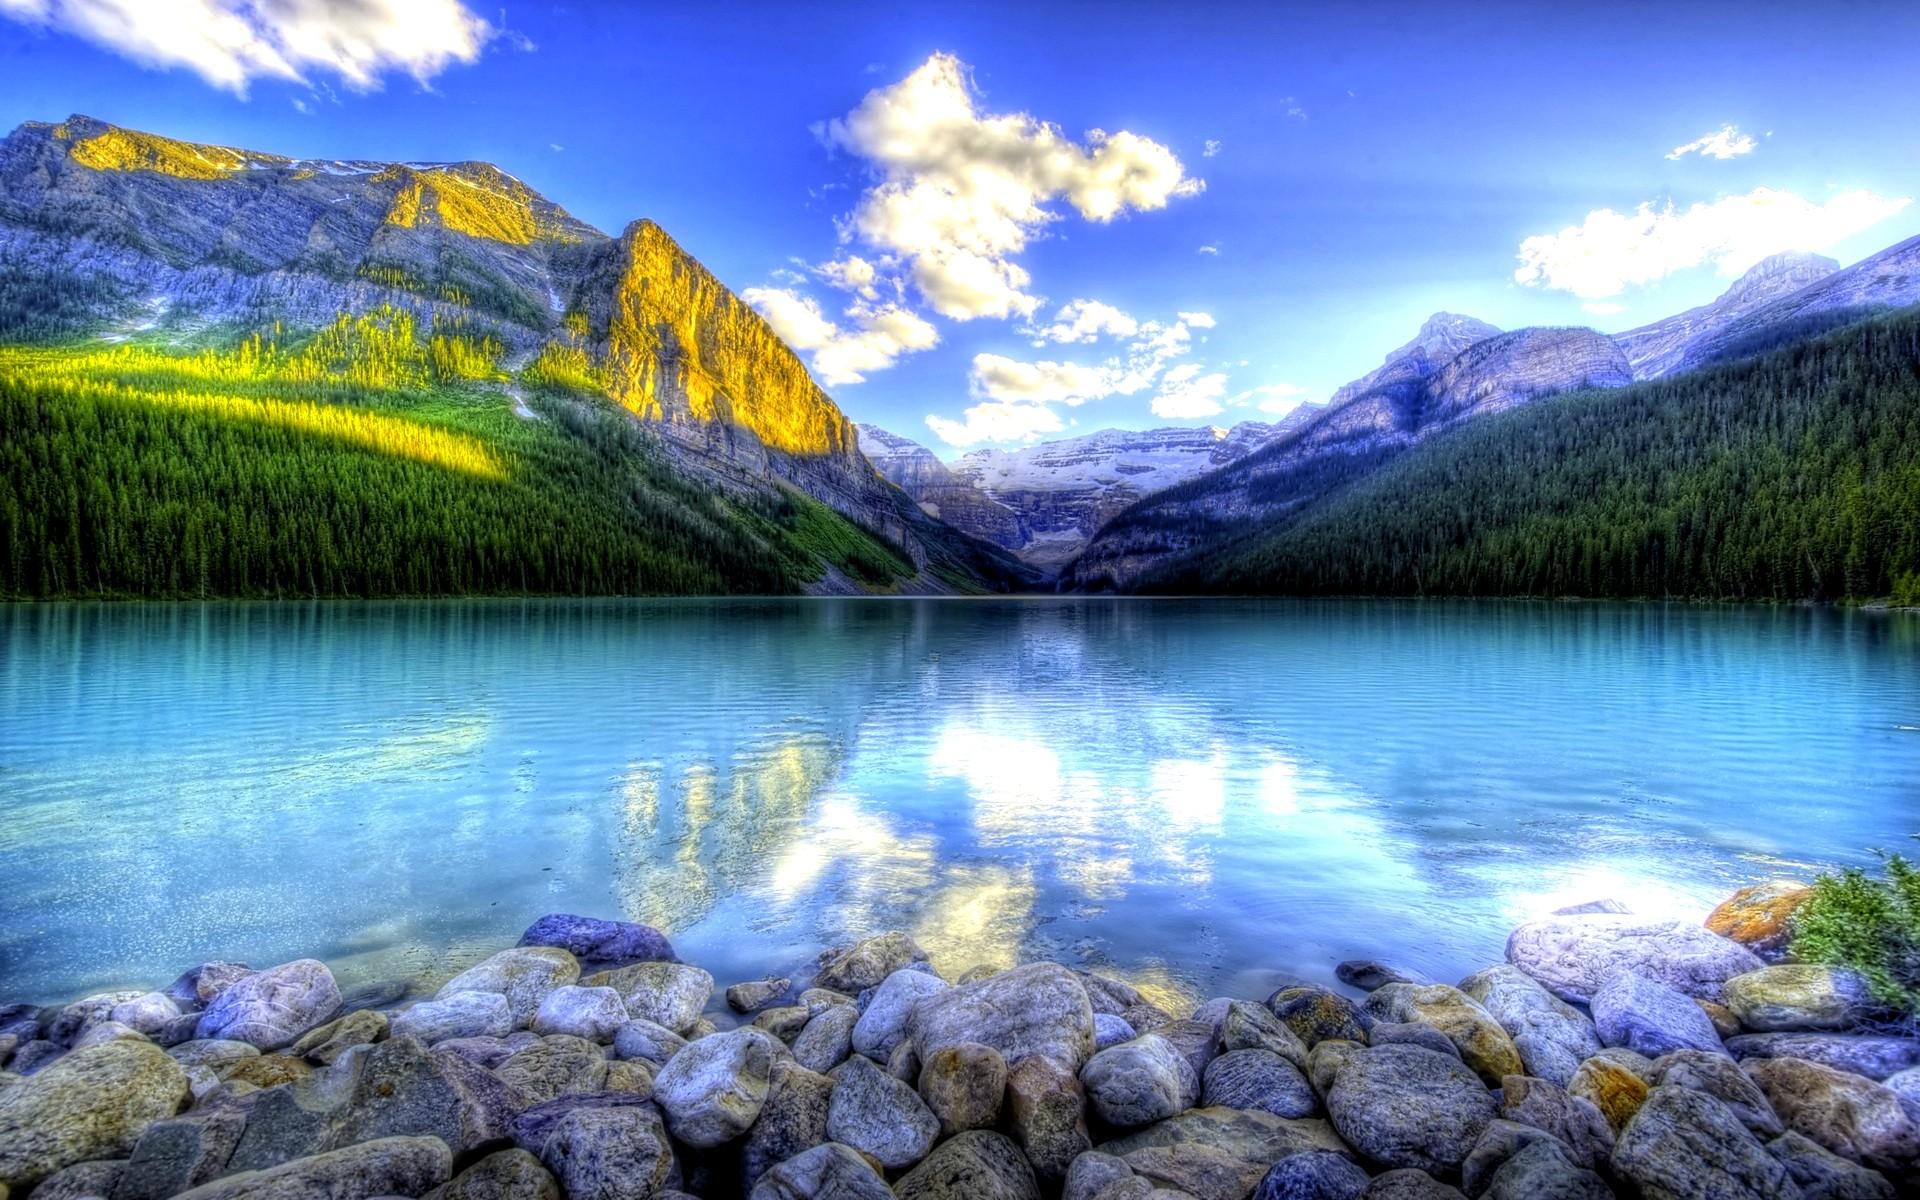 Mountain Lake Wallpaper High Resolution